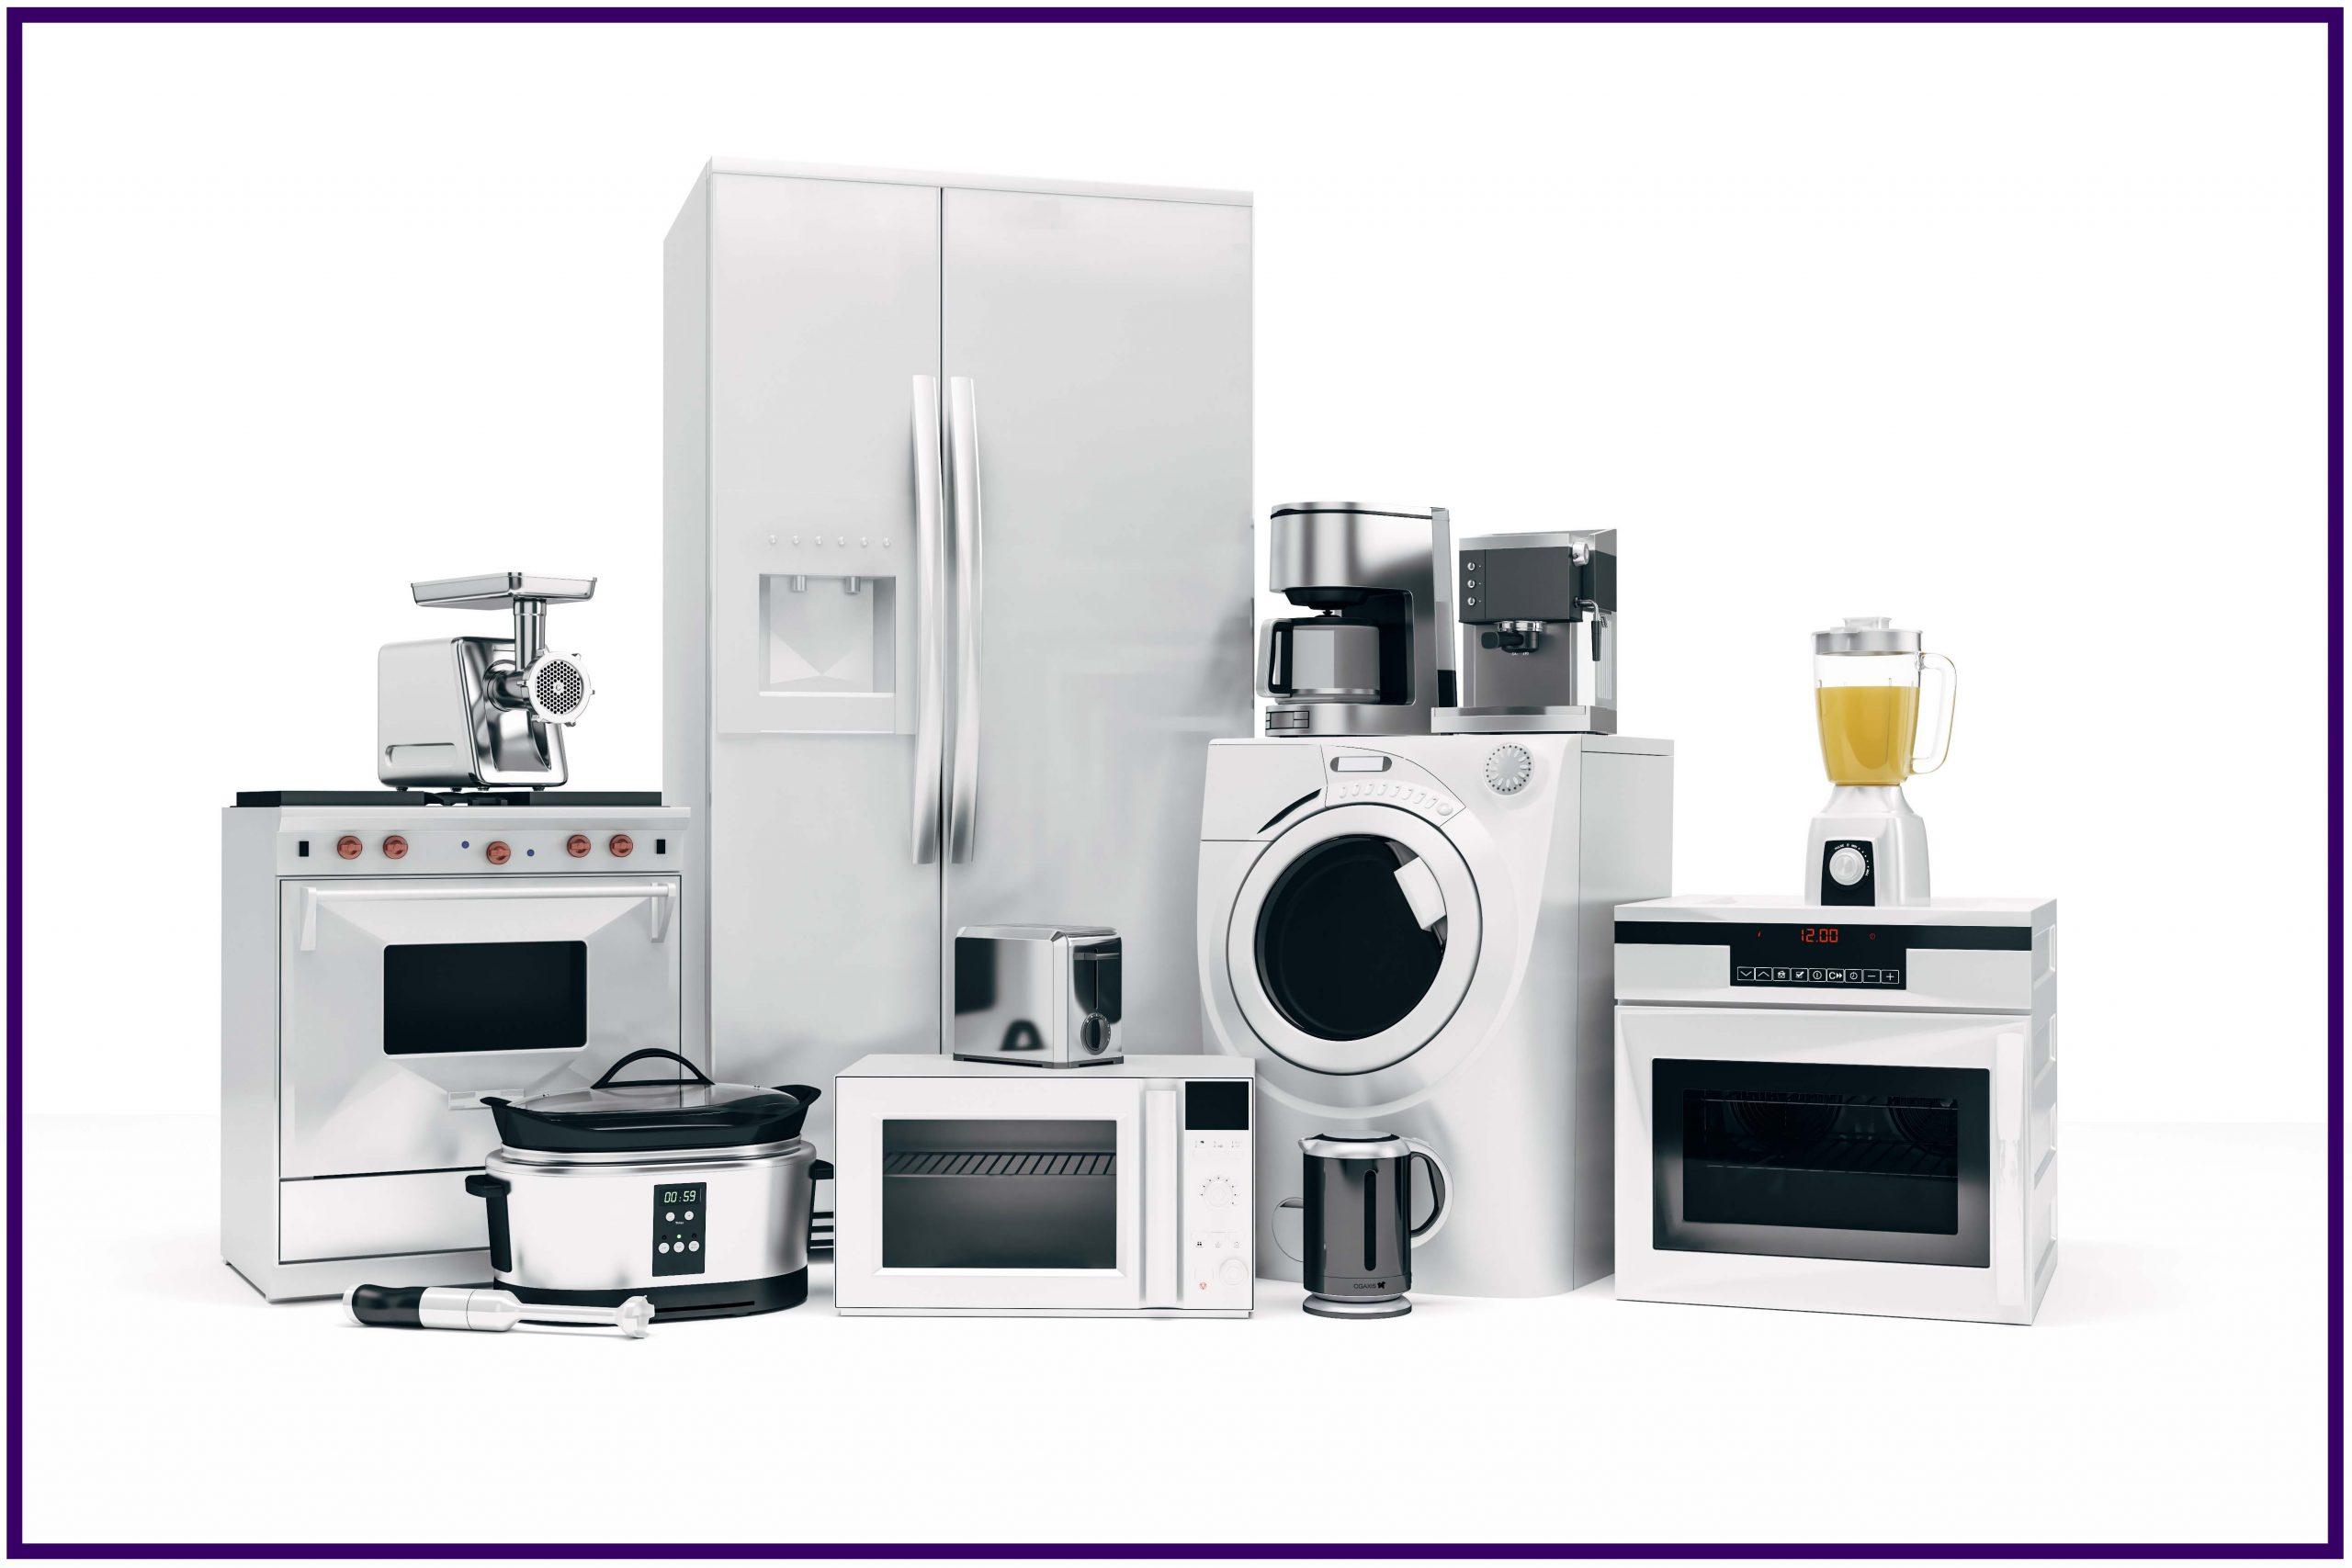 Appliances in food industry